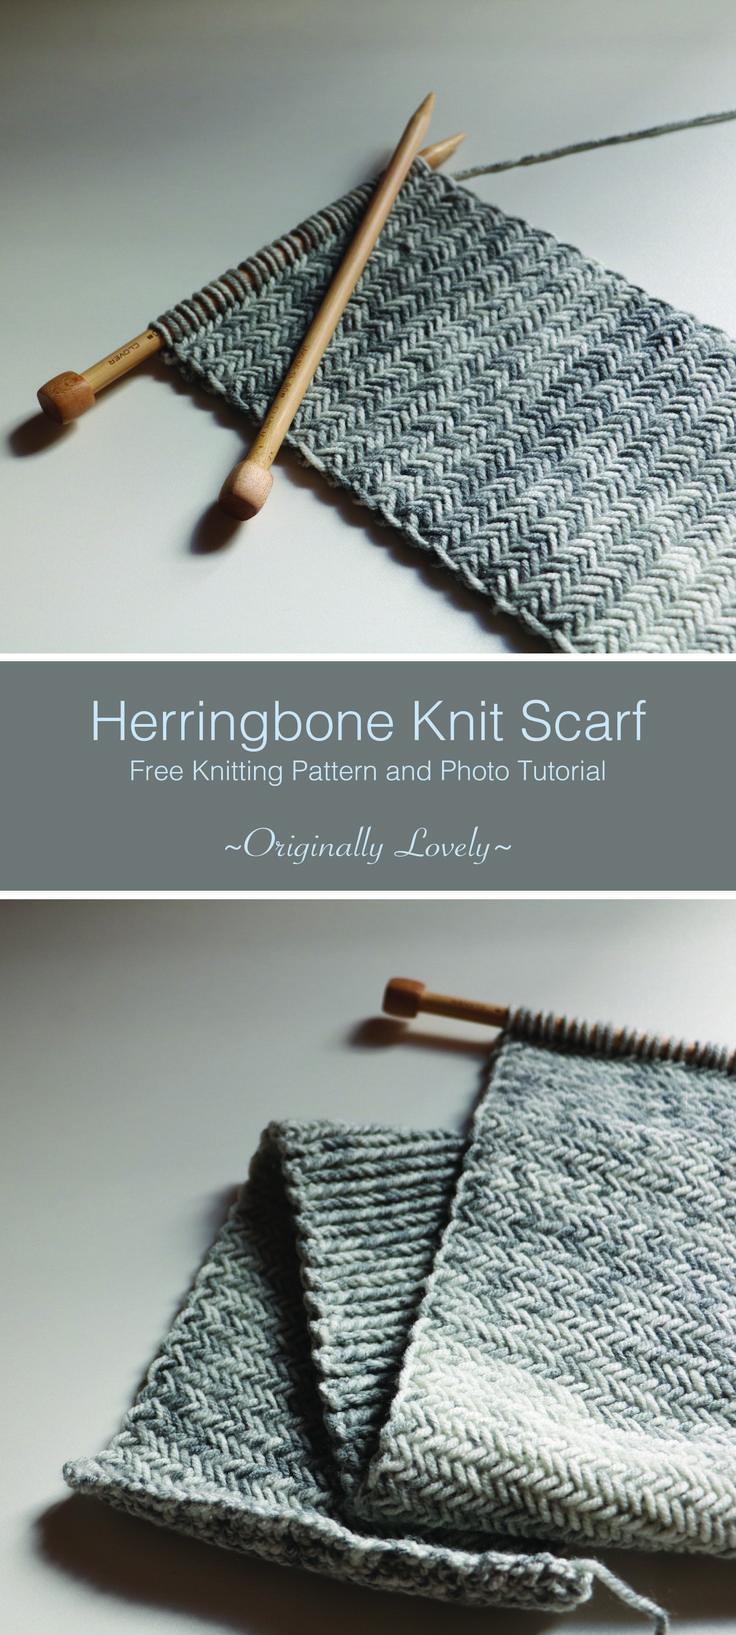 Herringbone Knit Scarf | Herringbone, Knit patterns and Scarves